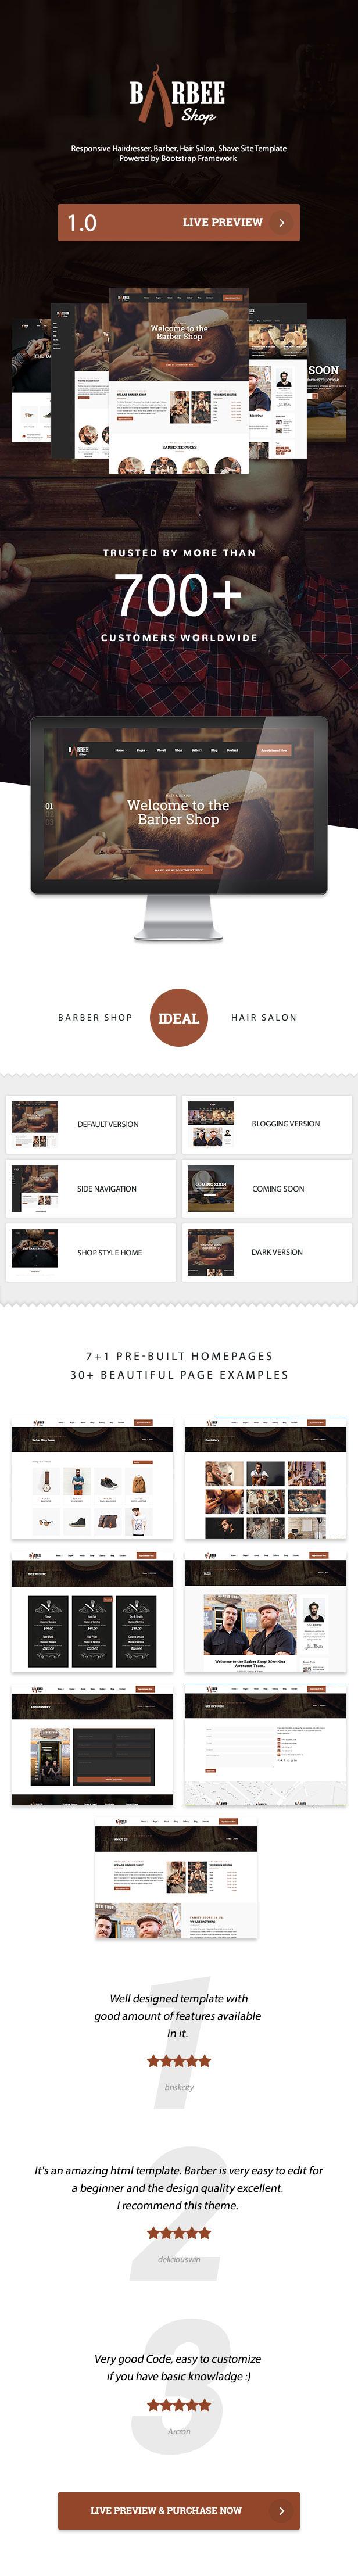 Barbee | Responsive Barber Shop & Hair Salon WordPress Theme - 3